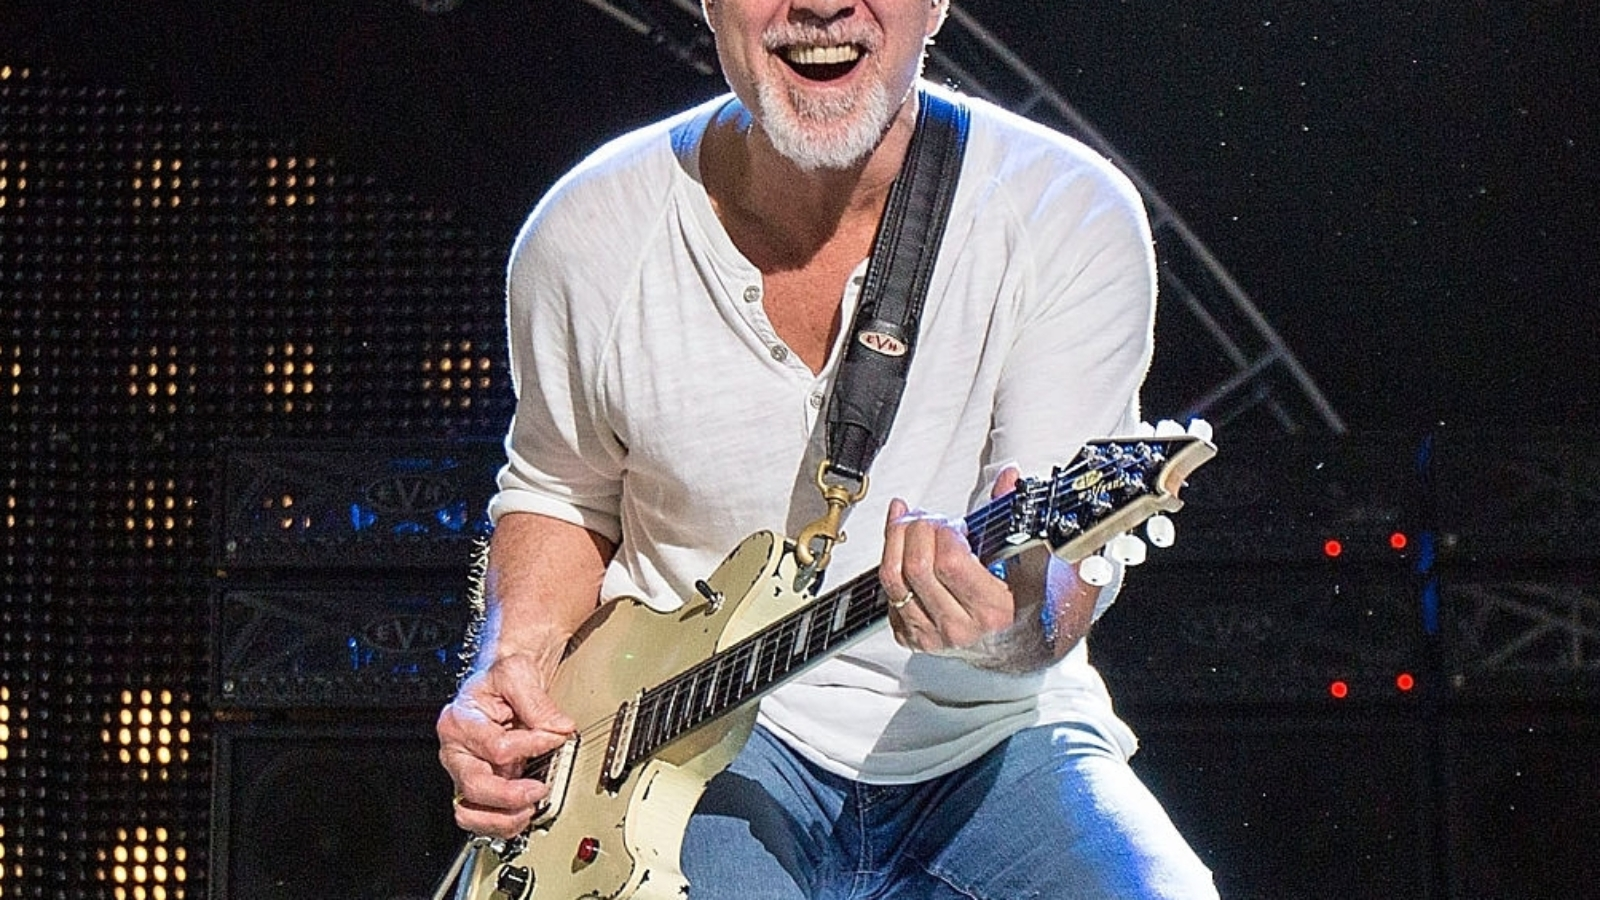 CHULA VISTA, CA - SEPTEMBER 30:  Guitarist Eddie Van Halen of Van Halen performs on stage at Sleep Train Amphitheatre on September 30, 2015 in Chula Vista, California.  (Photo by Daniel Knighton/Getty Images)